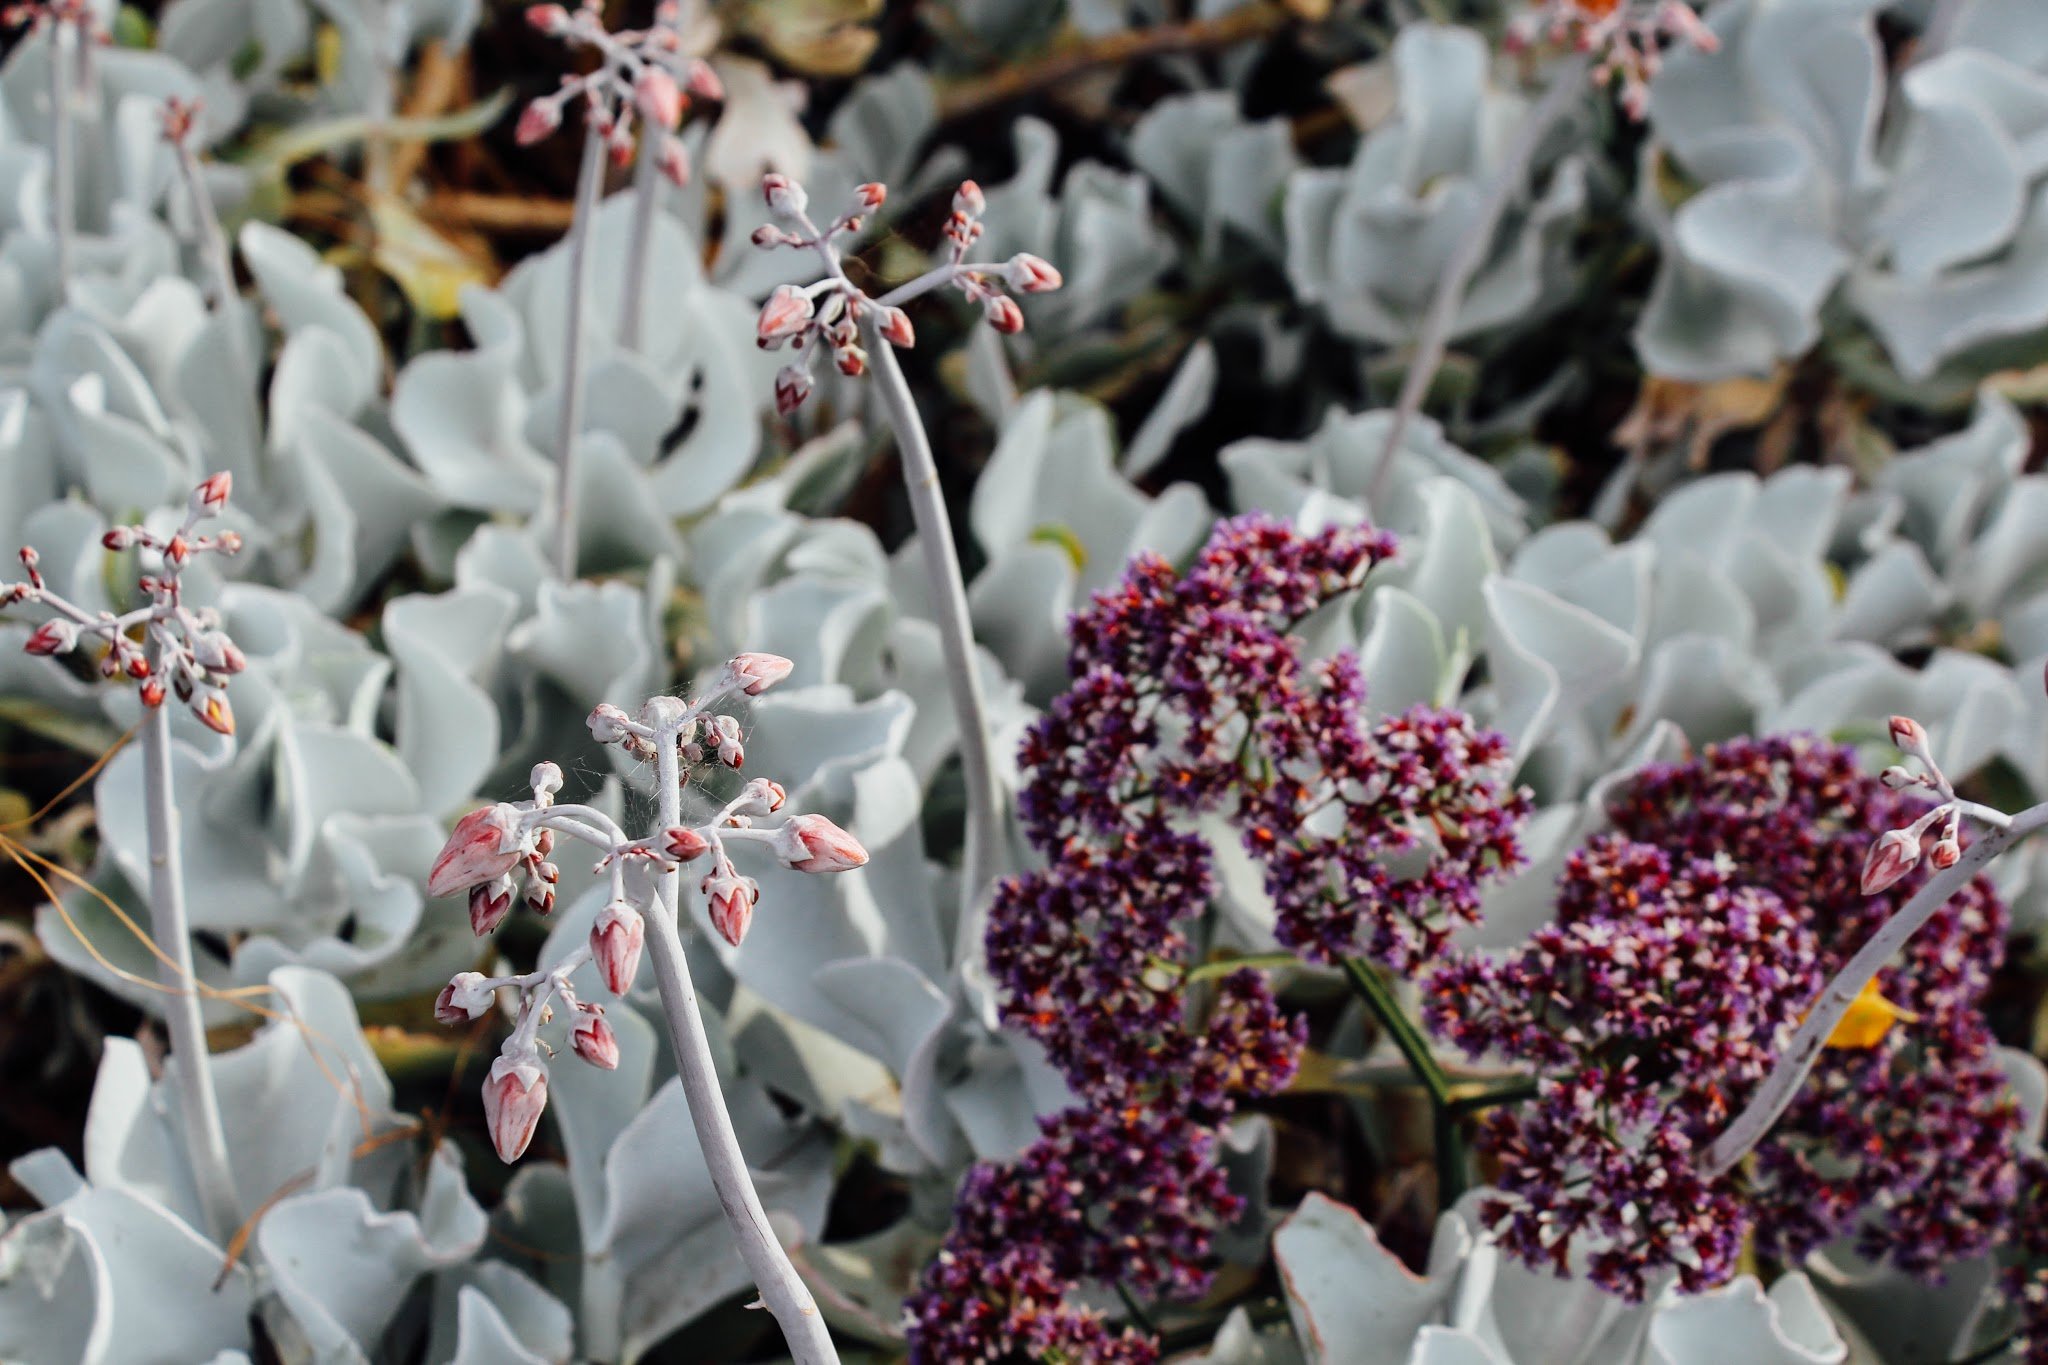 Melbourne Guide Royal Botanic Gardens